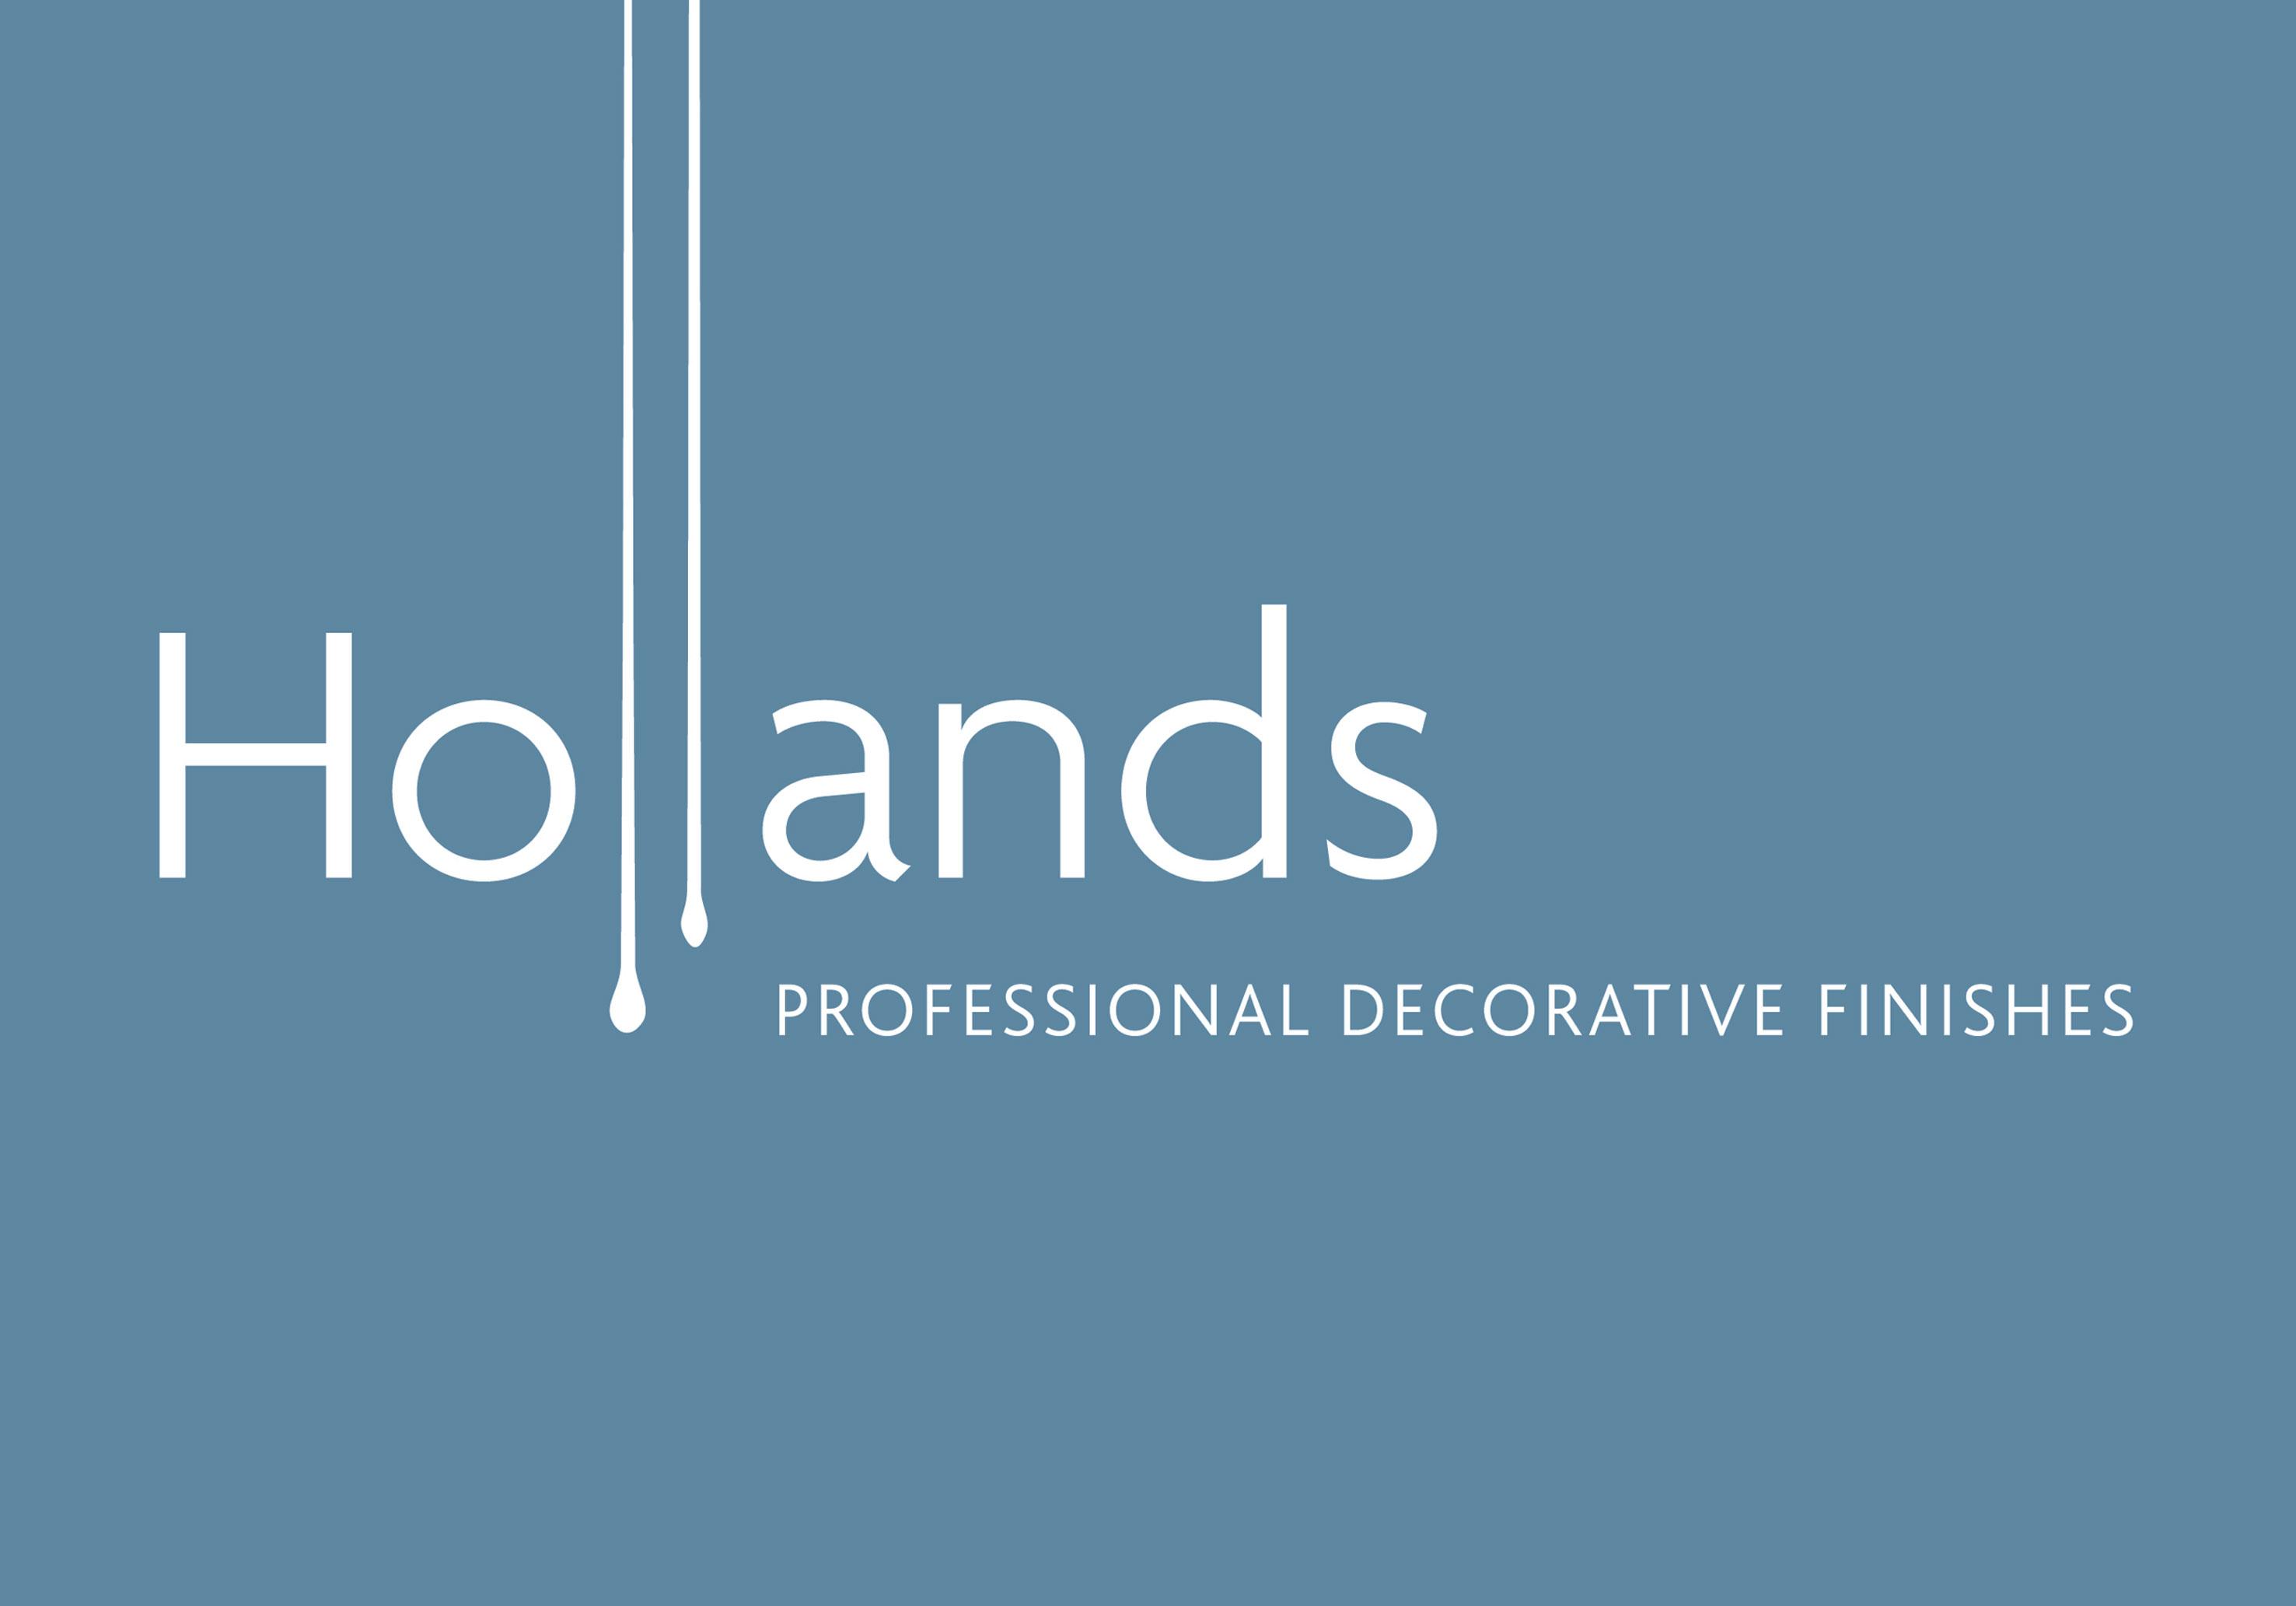 Hollands Professional Decorative Finishes Logo